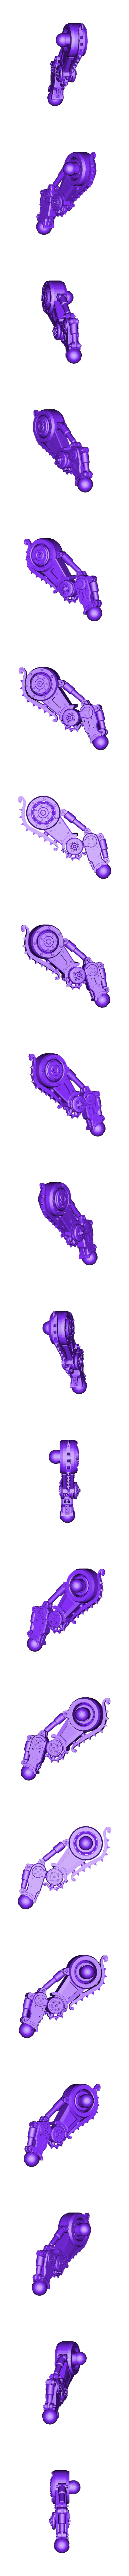 Penny 2.0 Leg 1B.stl Download STL file Penny Nun Bot 2.0 • 3D print model, Leesedrenfort